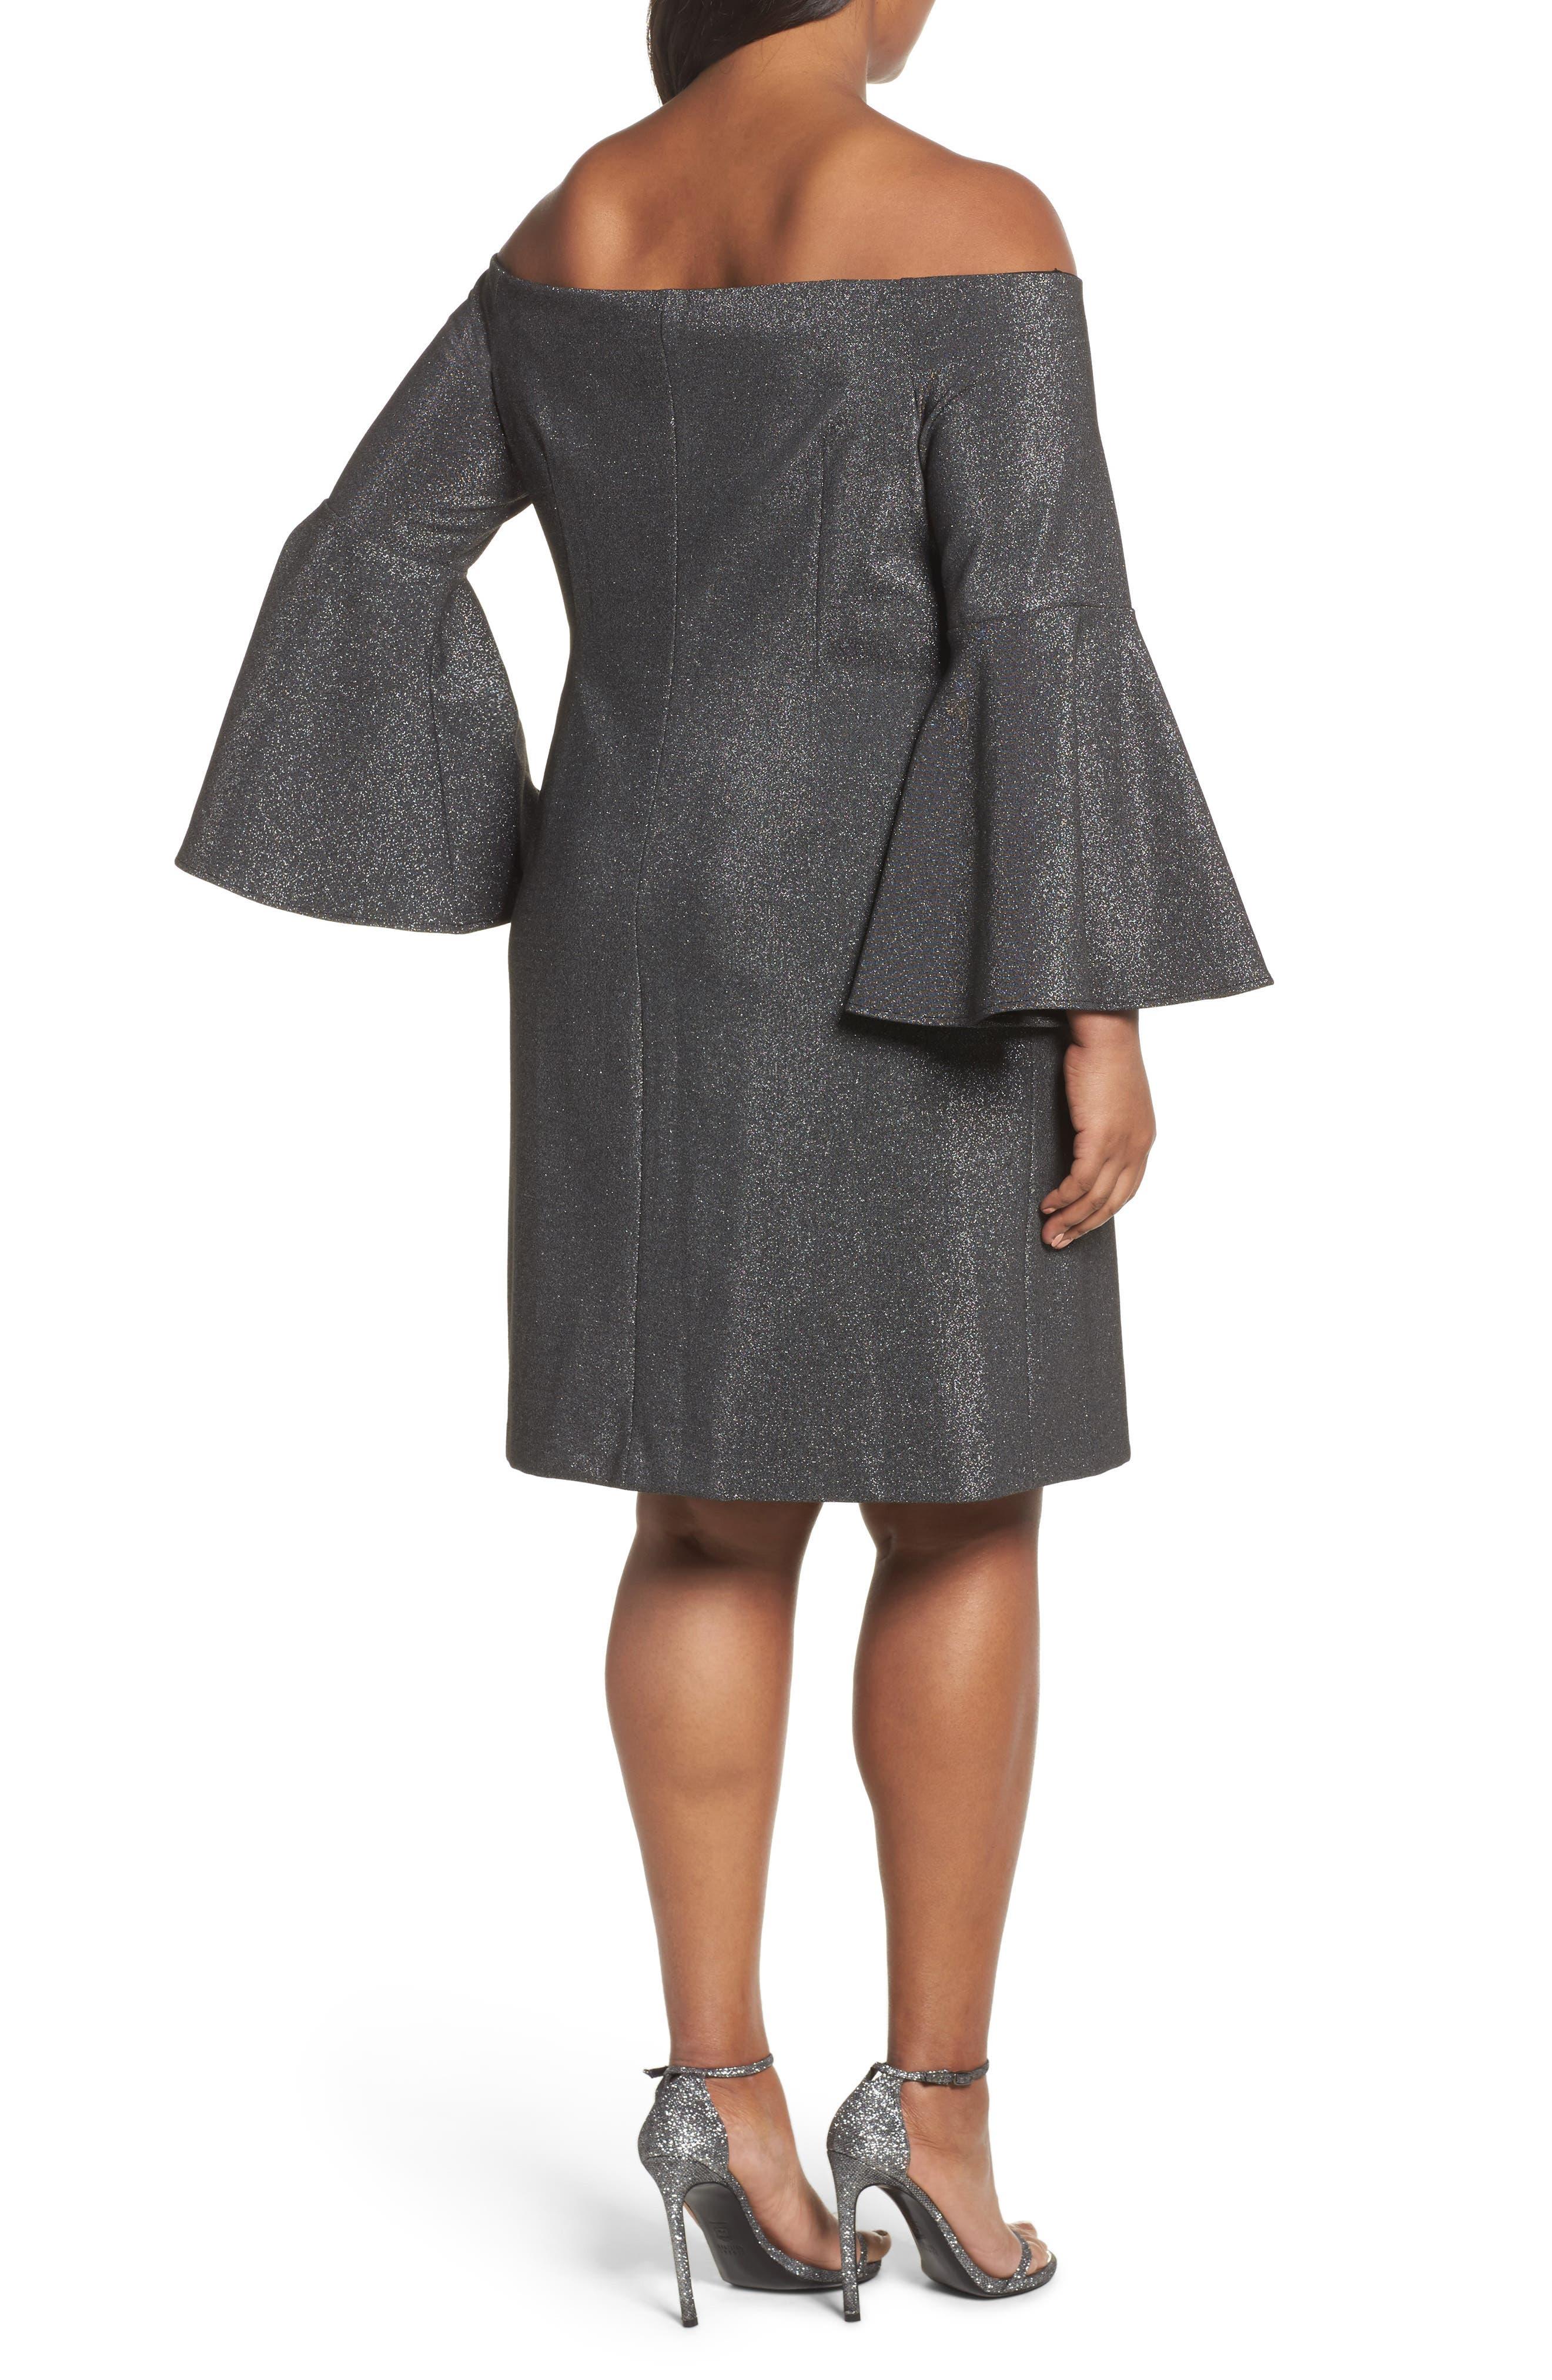 Off the Shoulder Metallic Sheath Dress,                             Alternate thumbnail 2, color,                             Rich Black